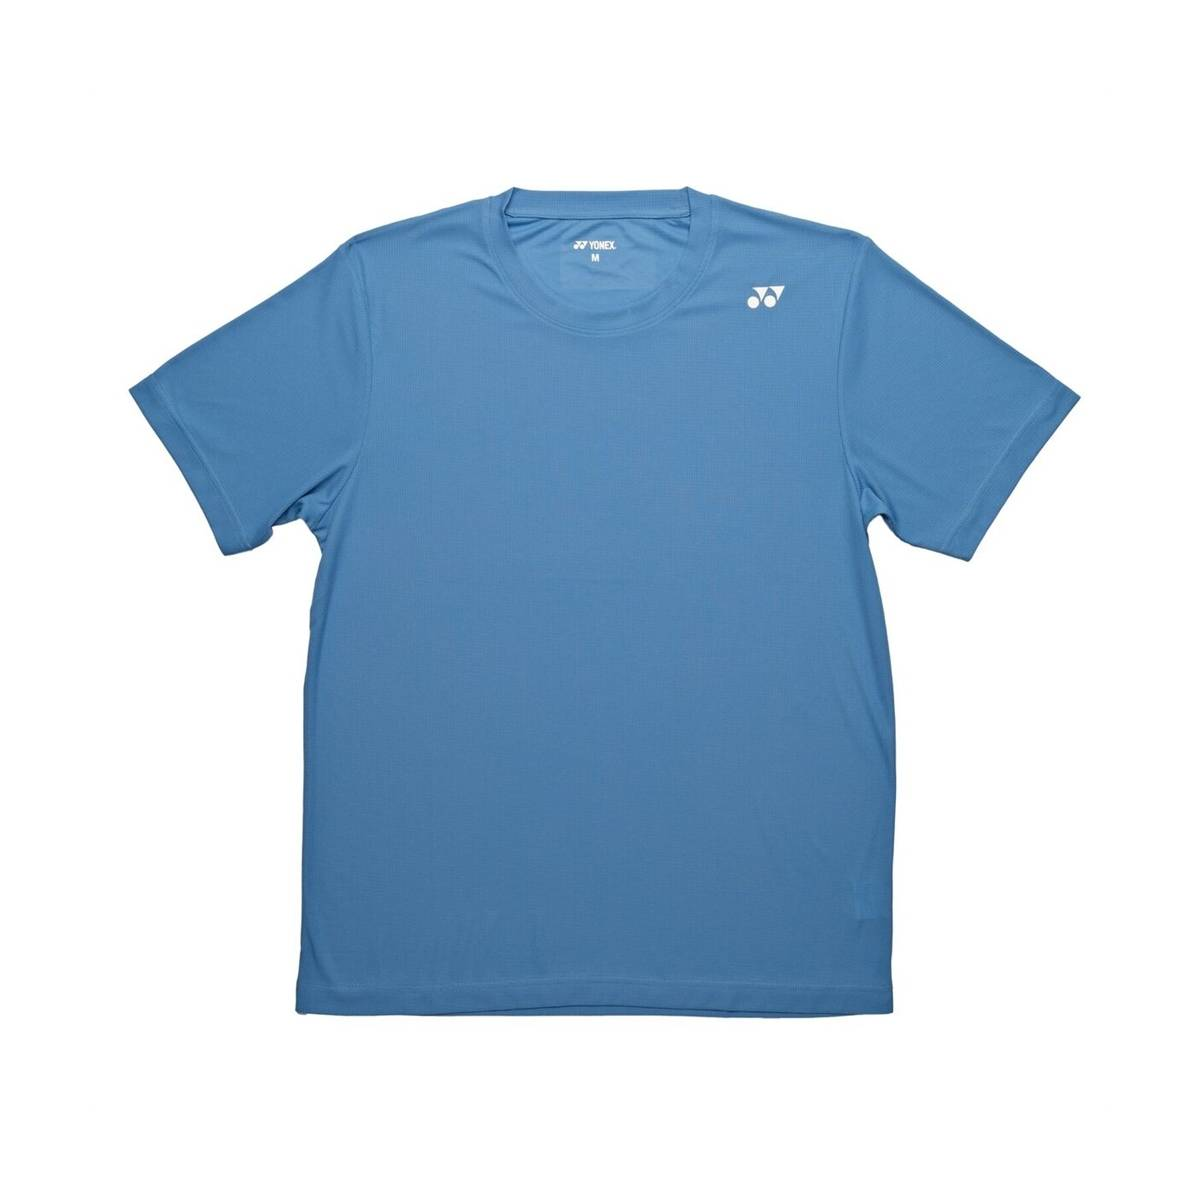 Yonex Milas Boys Tee Blue 164